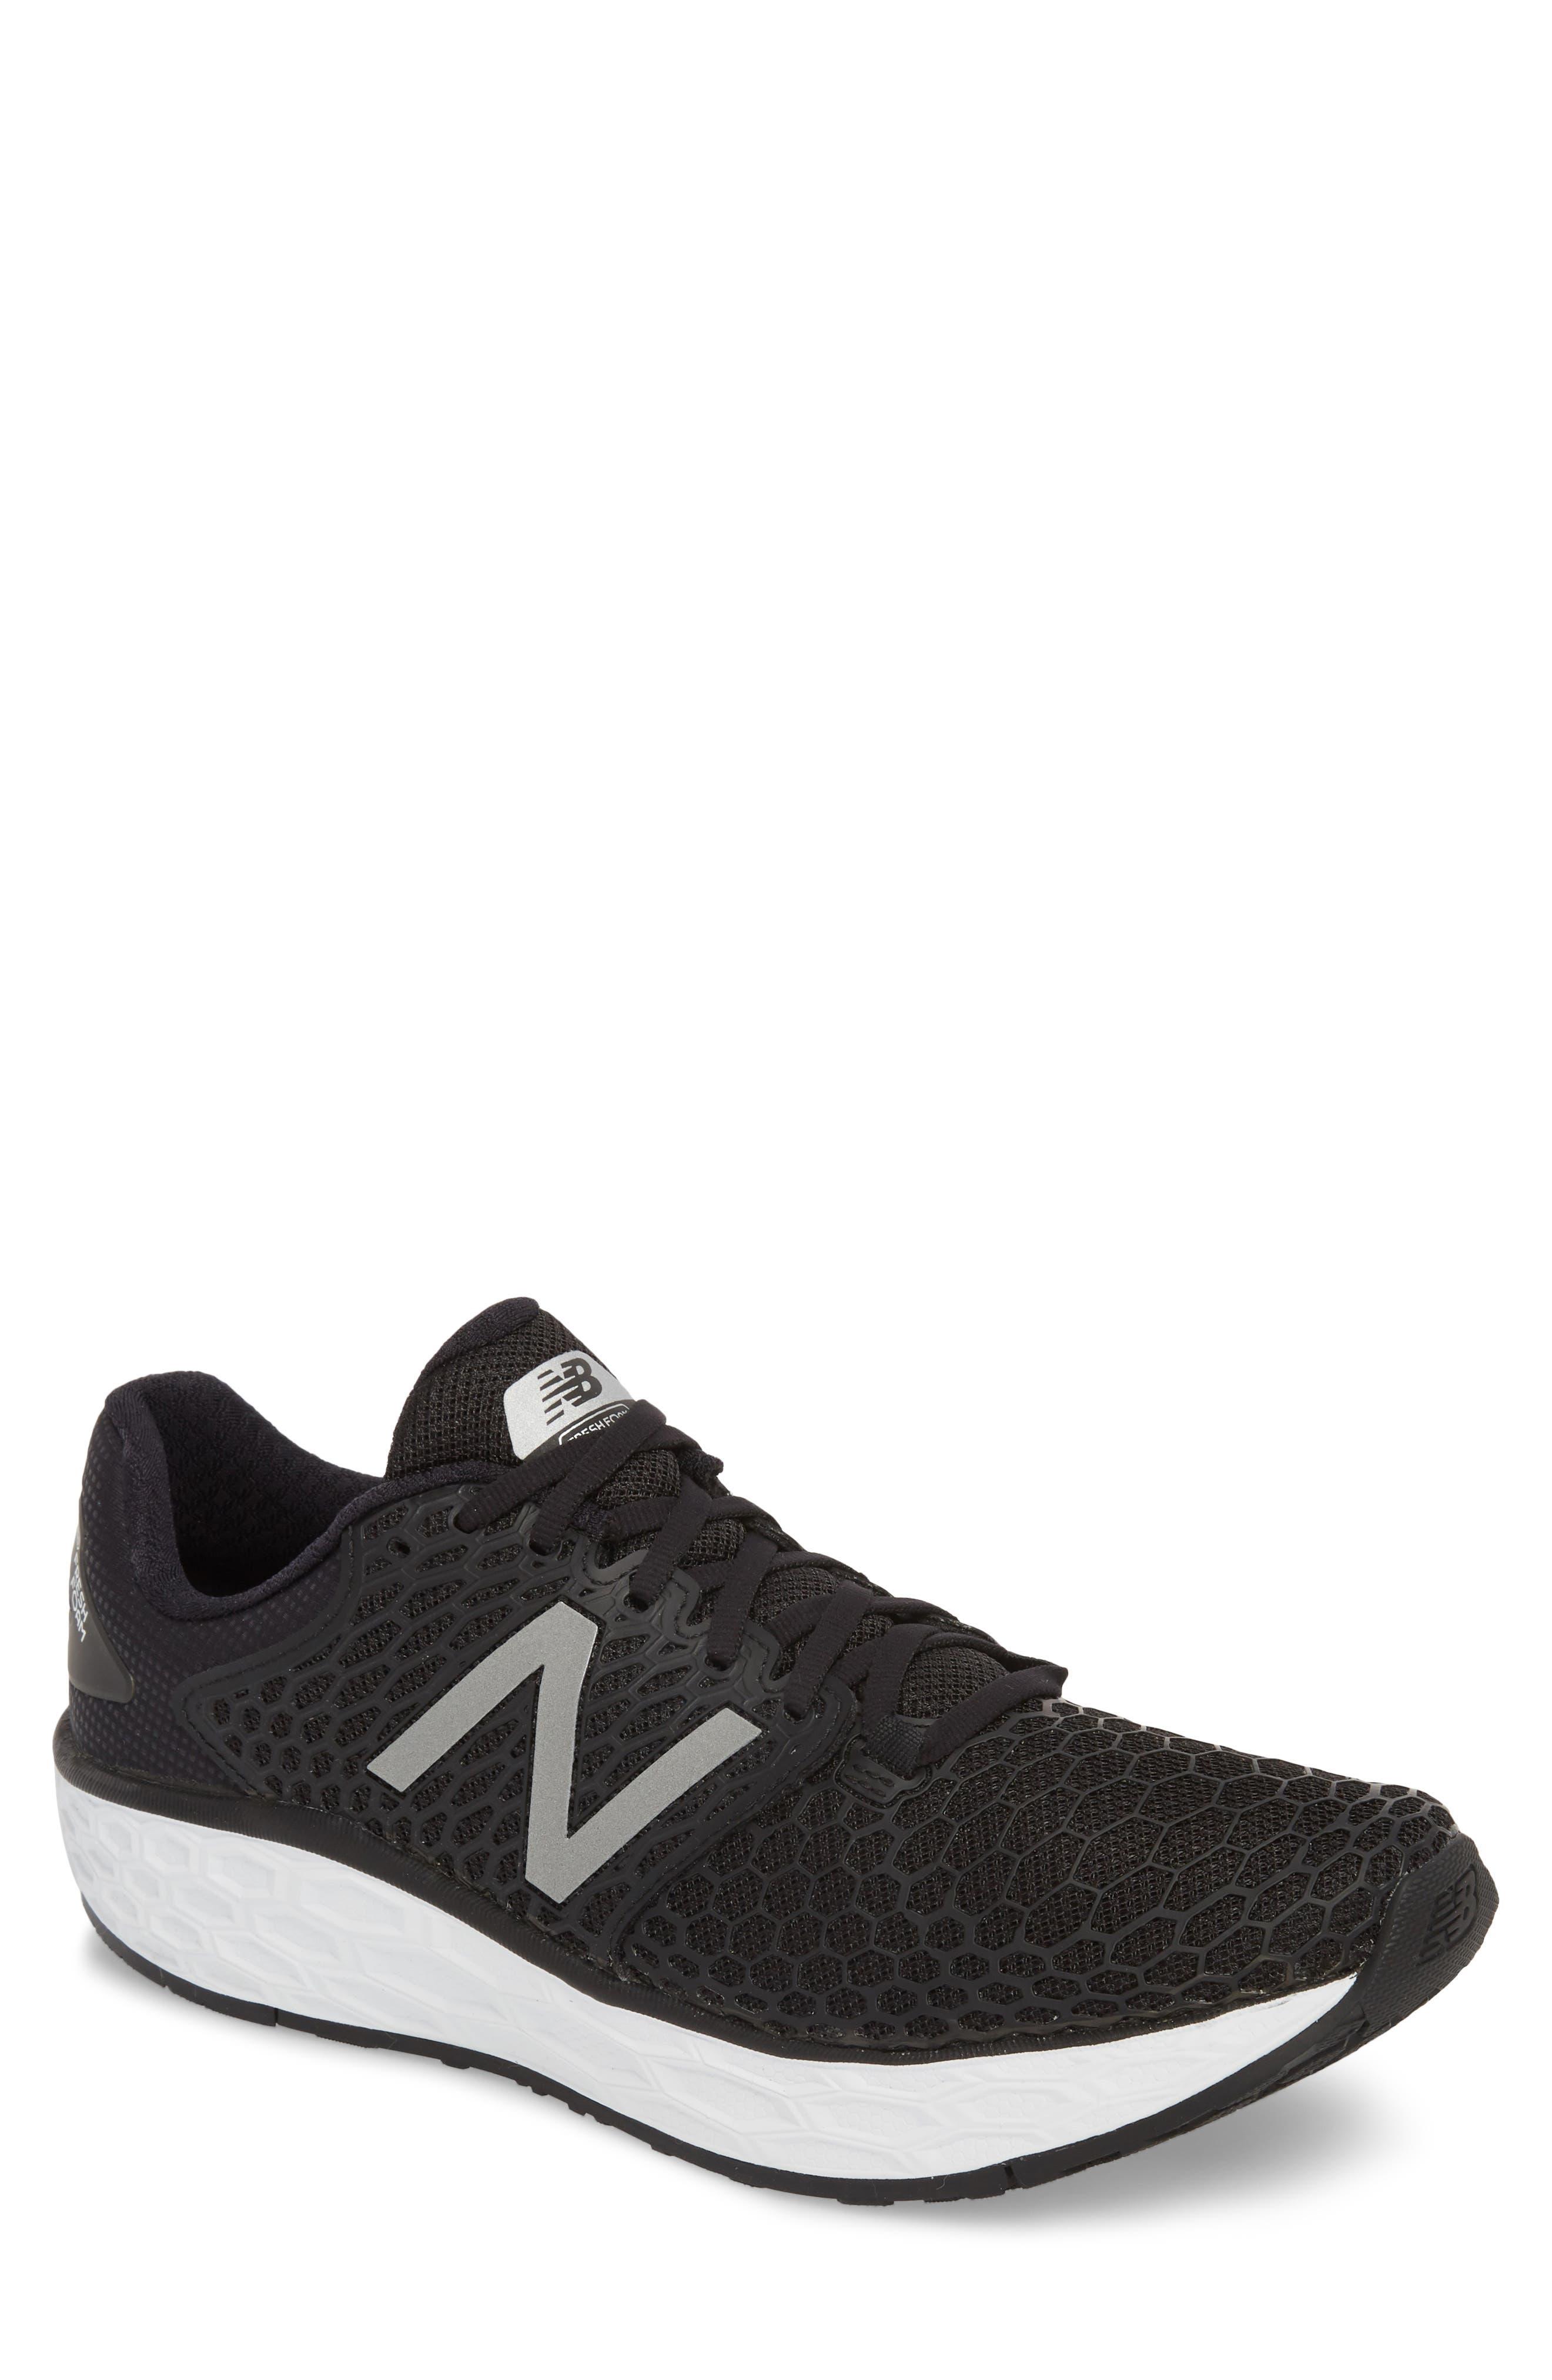 Fresh Foam Vongo v3 Running Shoe,                             Main thumbnail 1, color,                             BLACK